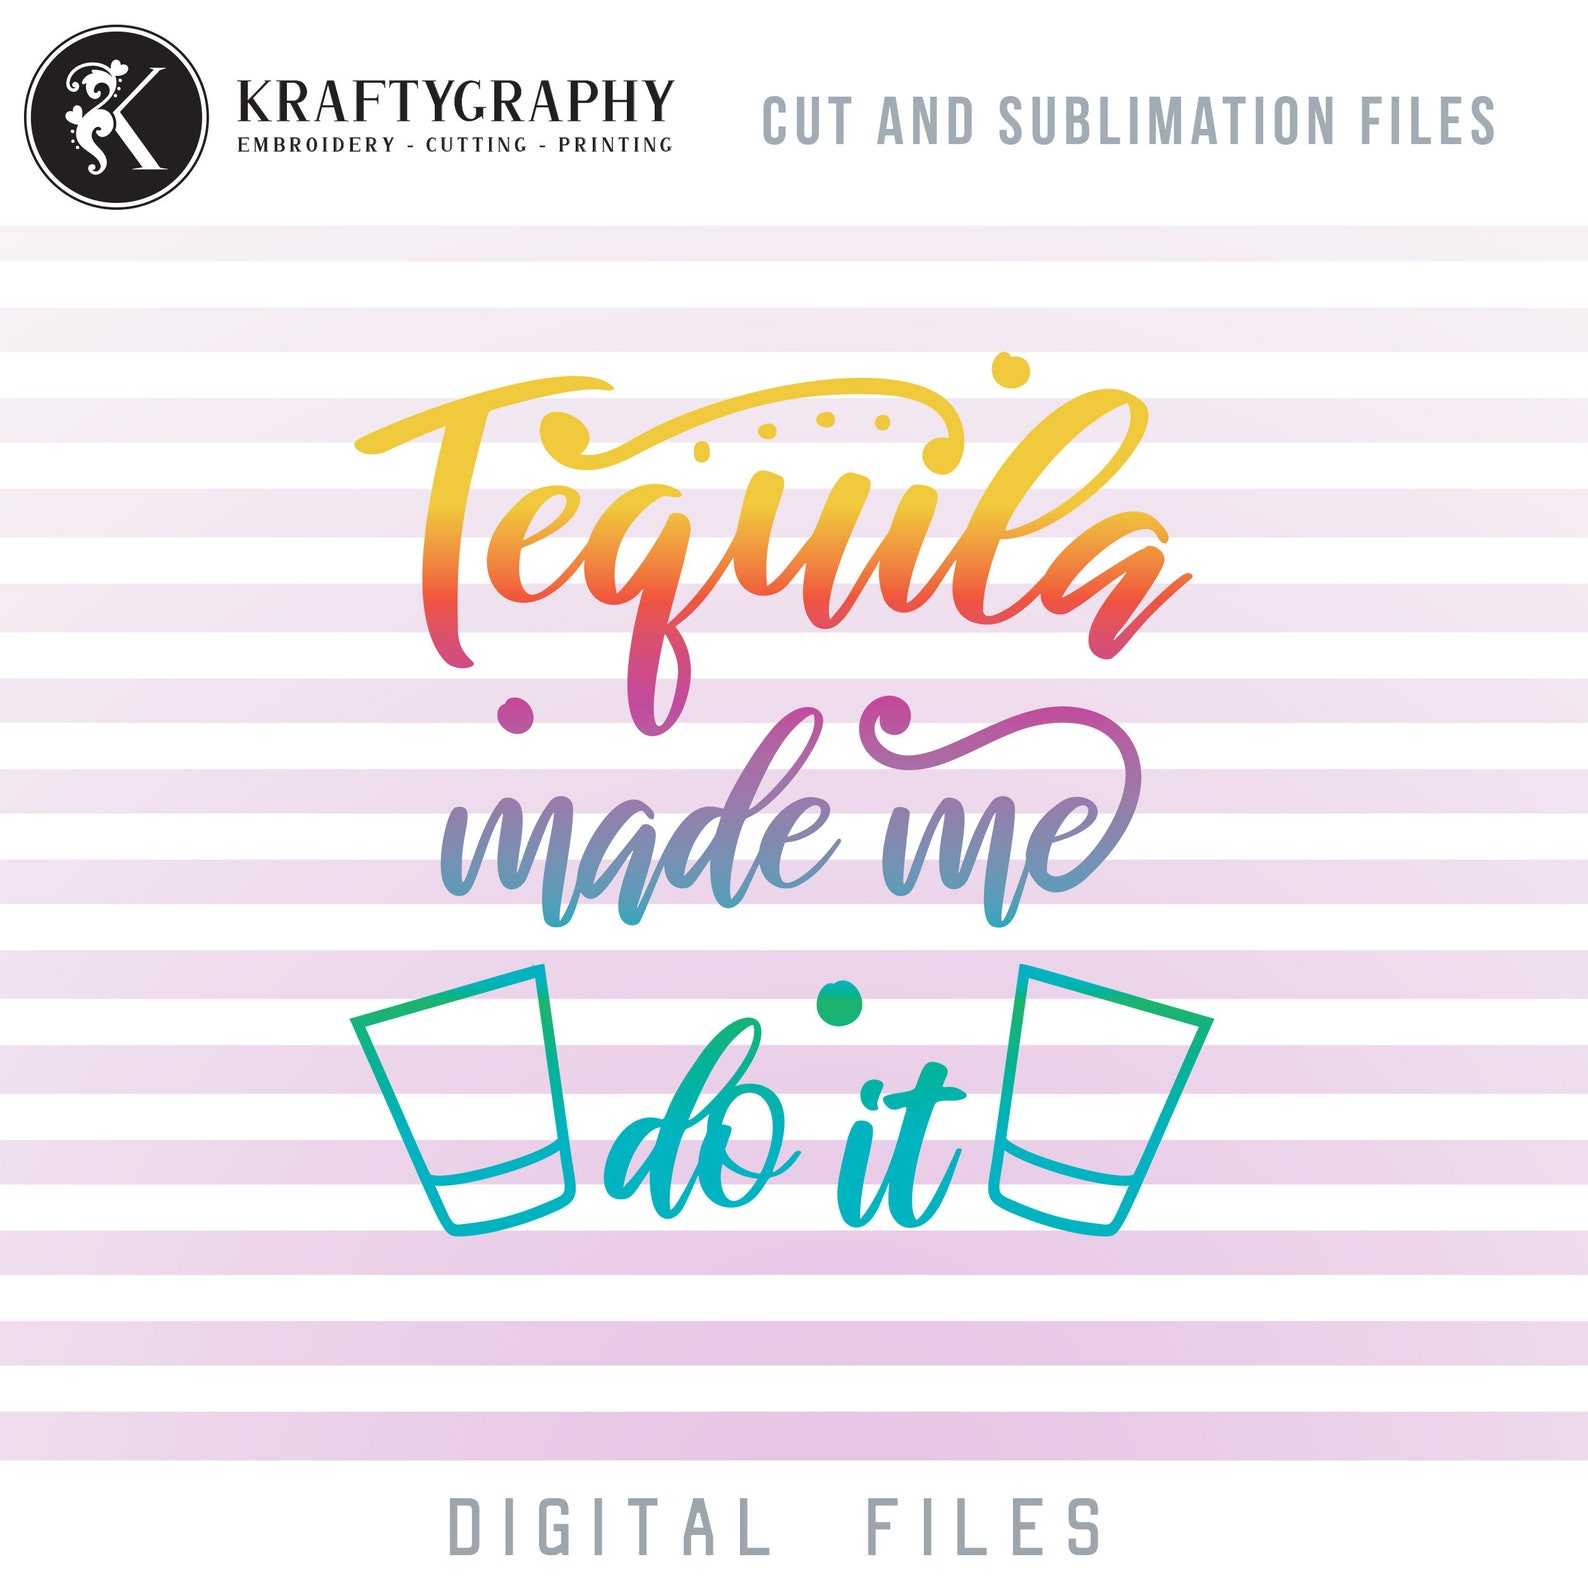 Tequila SVG lustige Trinken Sprüche PNG Sublimation Dateien | Etsy